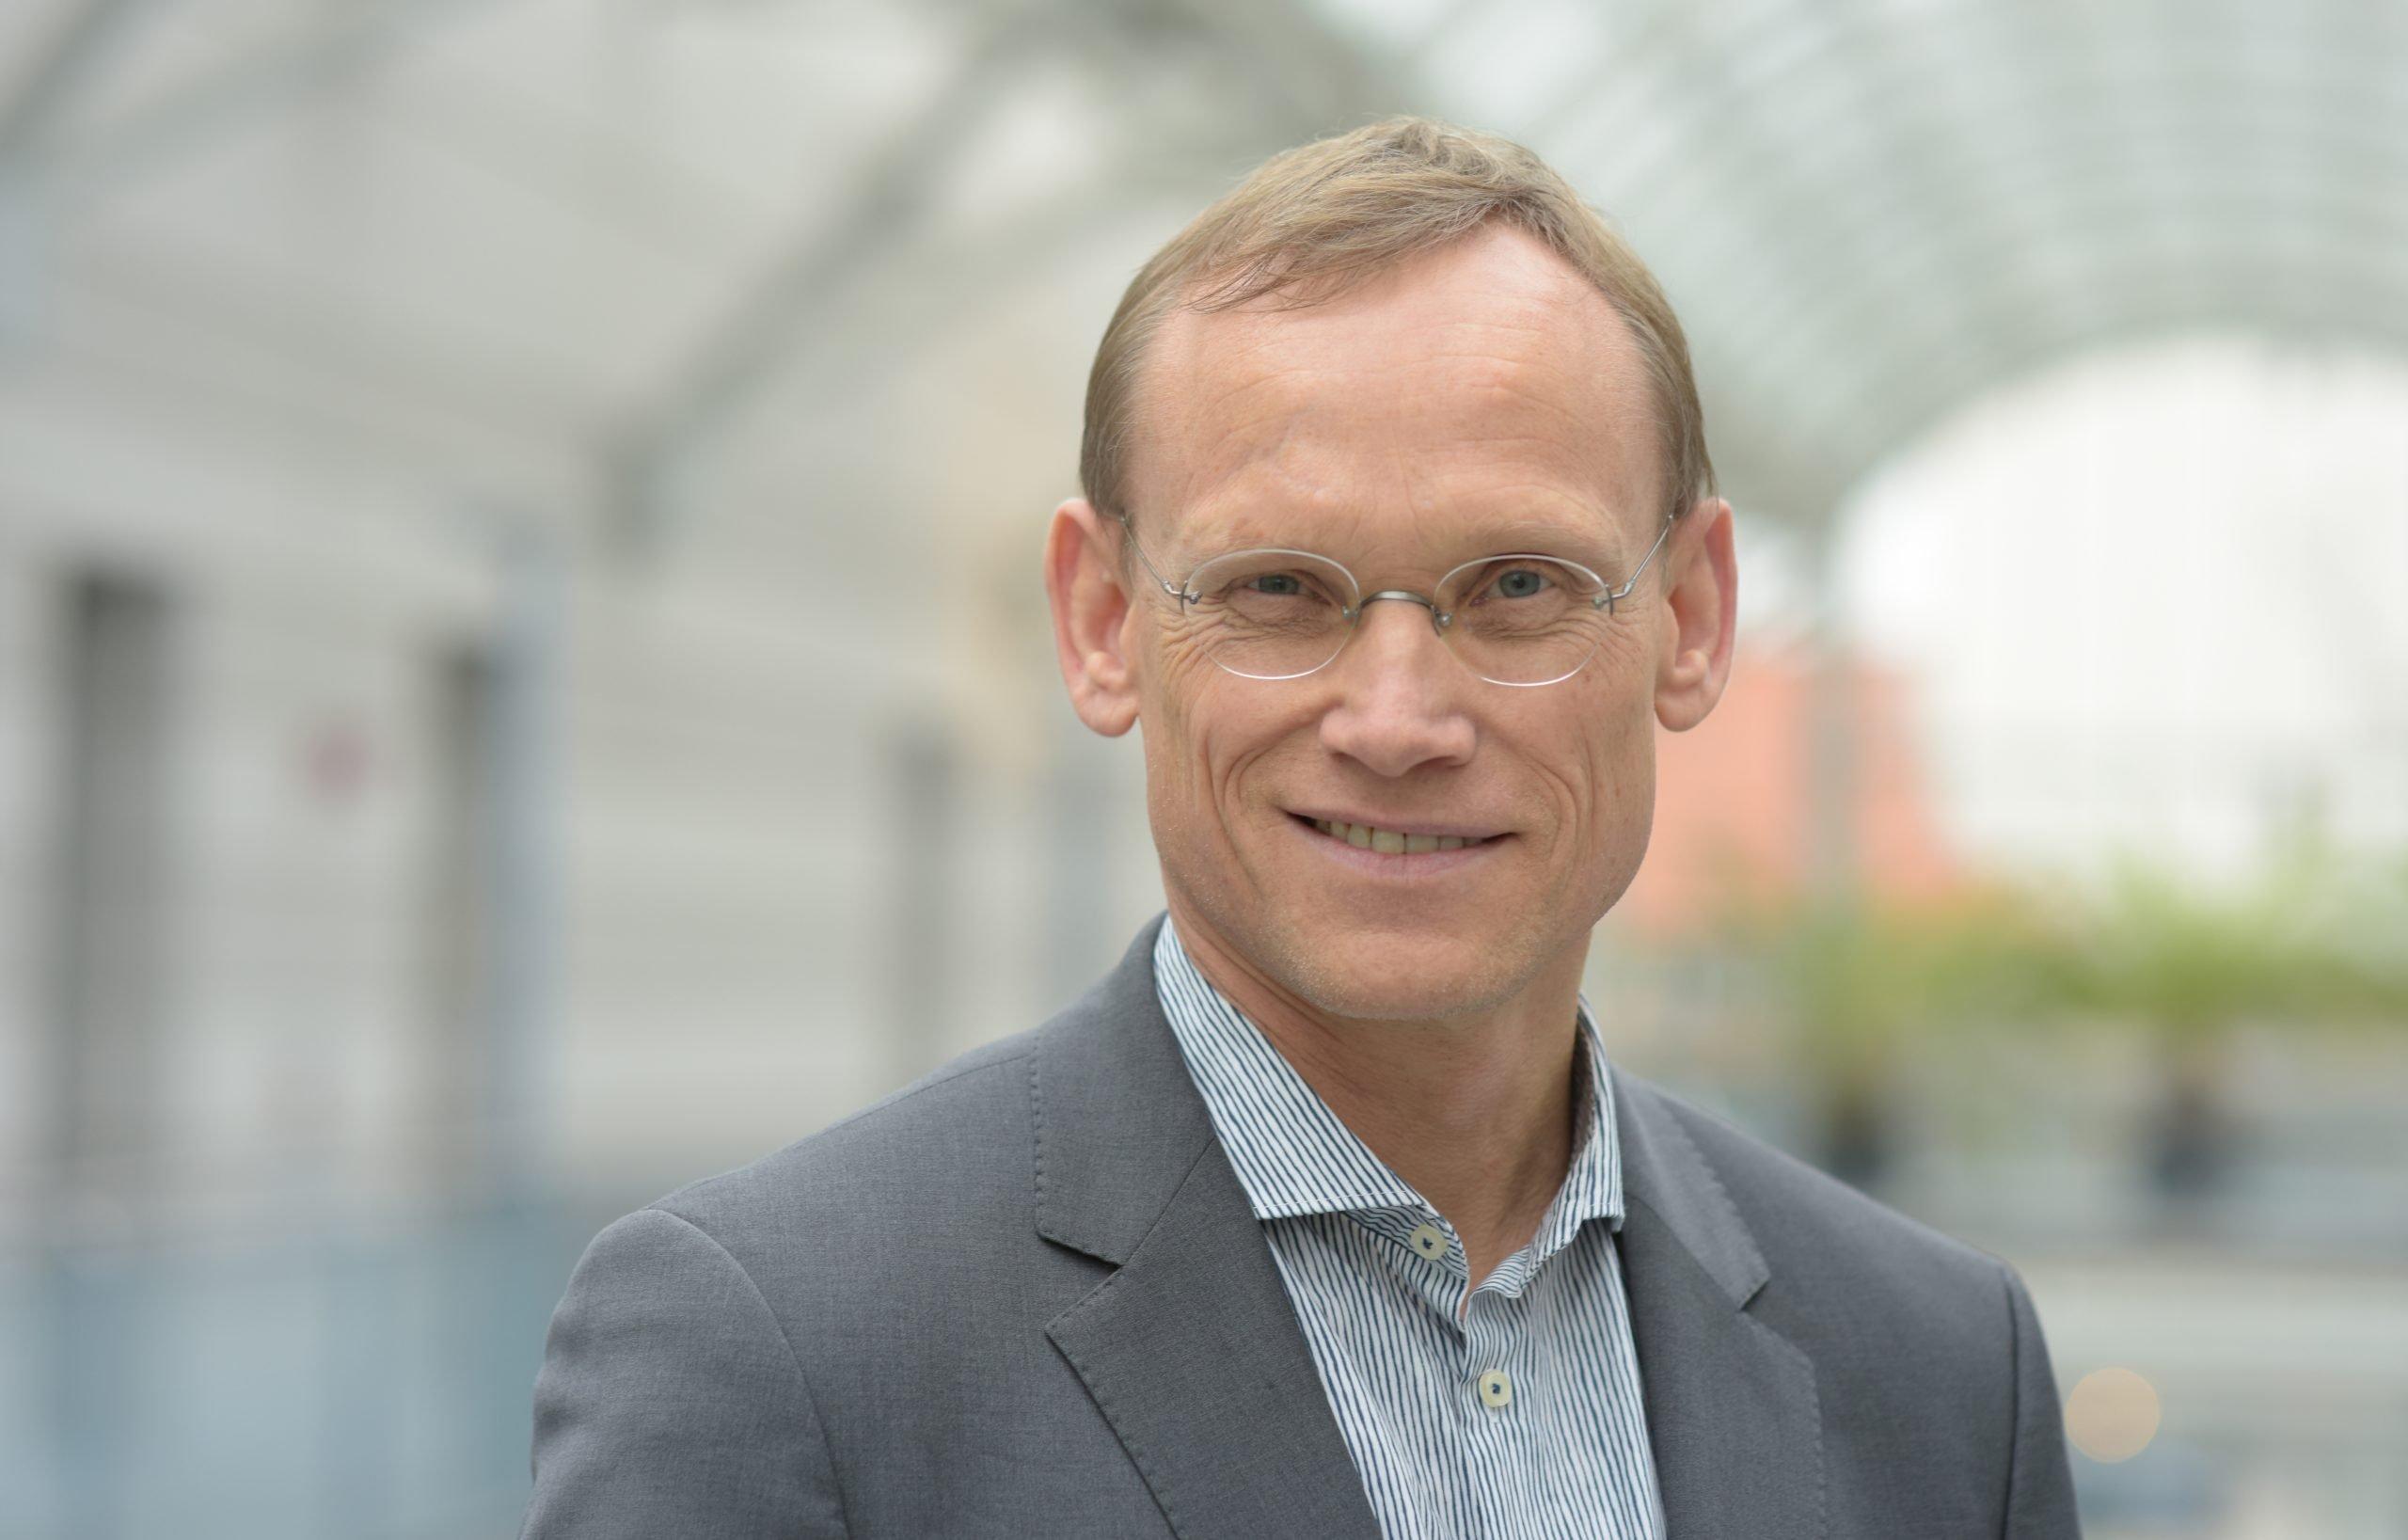 Professor Christoph Correll